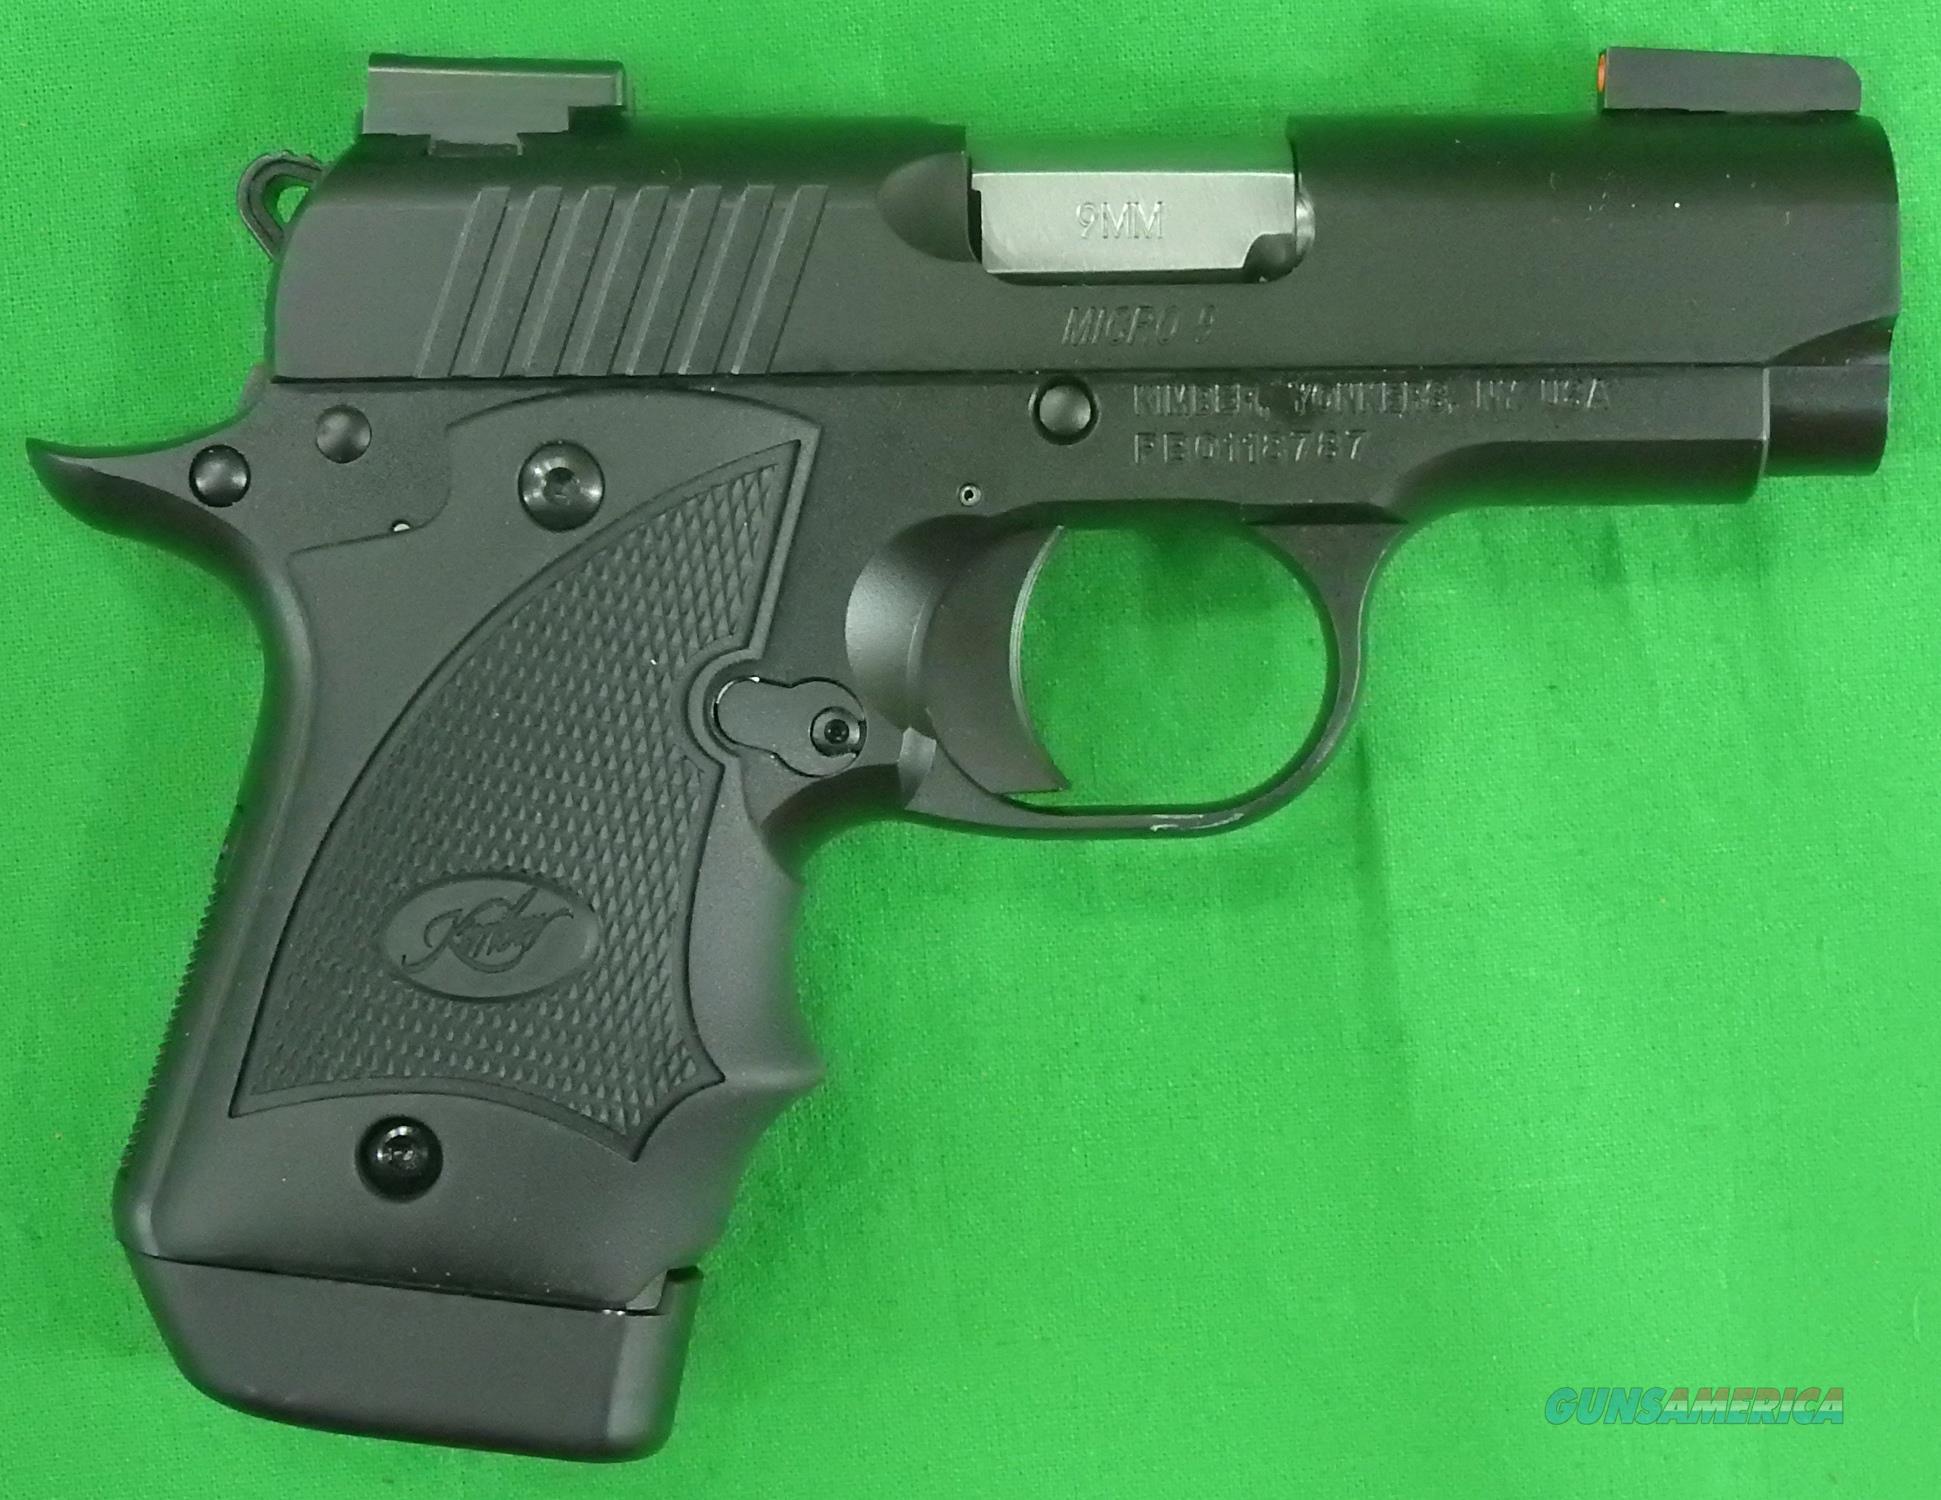 Micro 9 Nightfall TFX Pro 9mm 3.15In  3000194  Guns